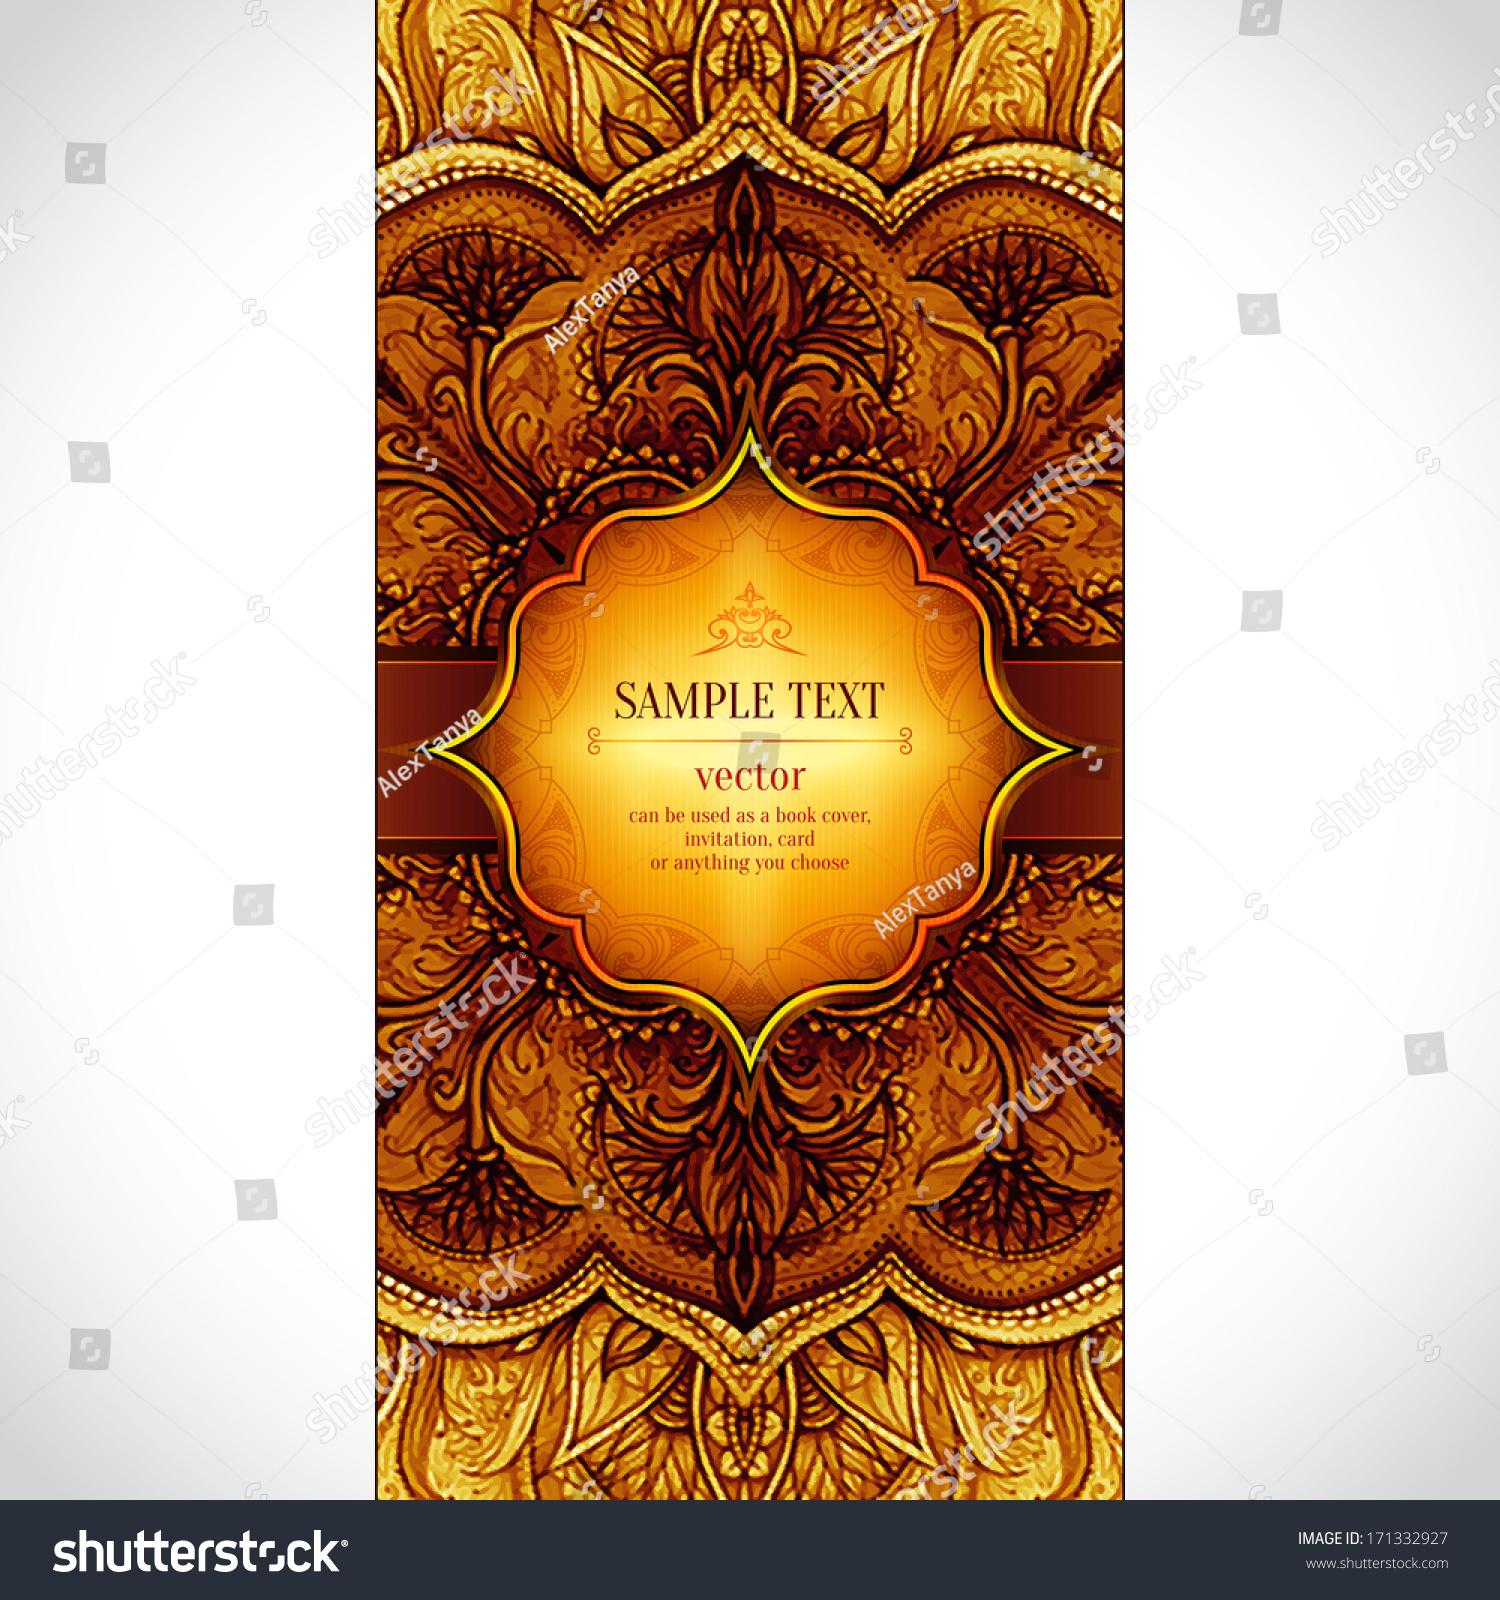 Vintage Book Cover Design Vector Free Download ~ Book cover design vector free download Диспетчер задач